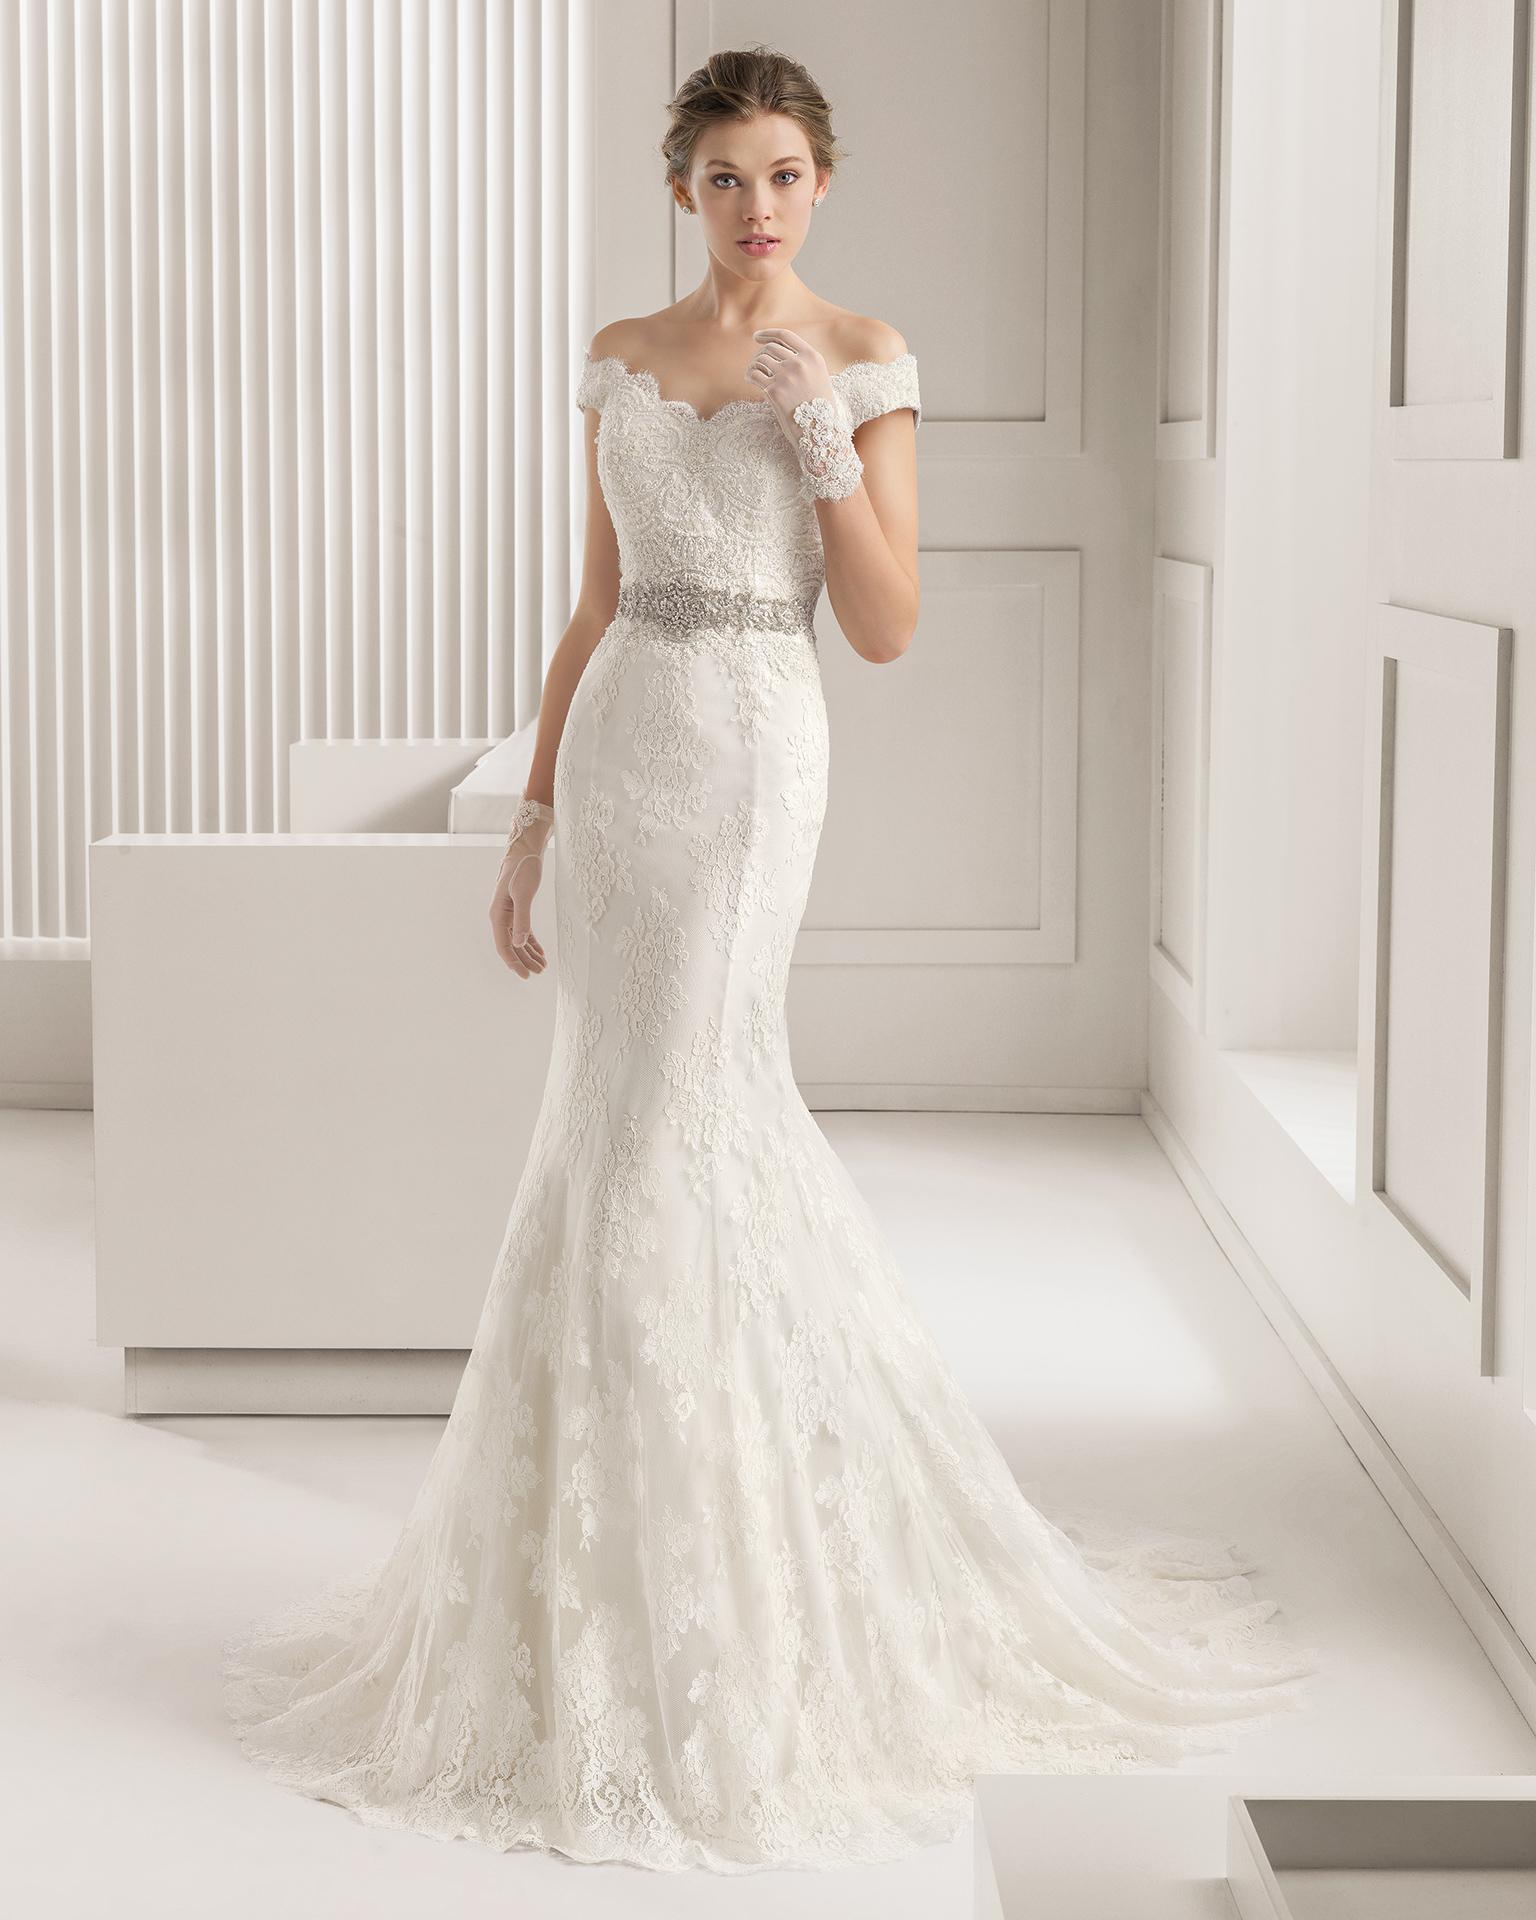 2015 Vintage Lace Mermaid Wedding Dresses f Shoulder